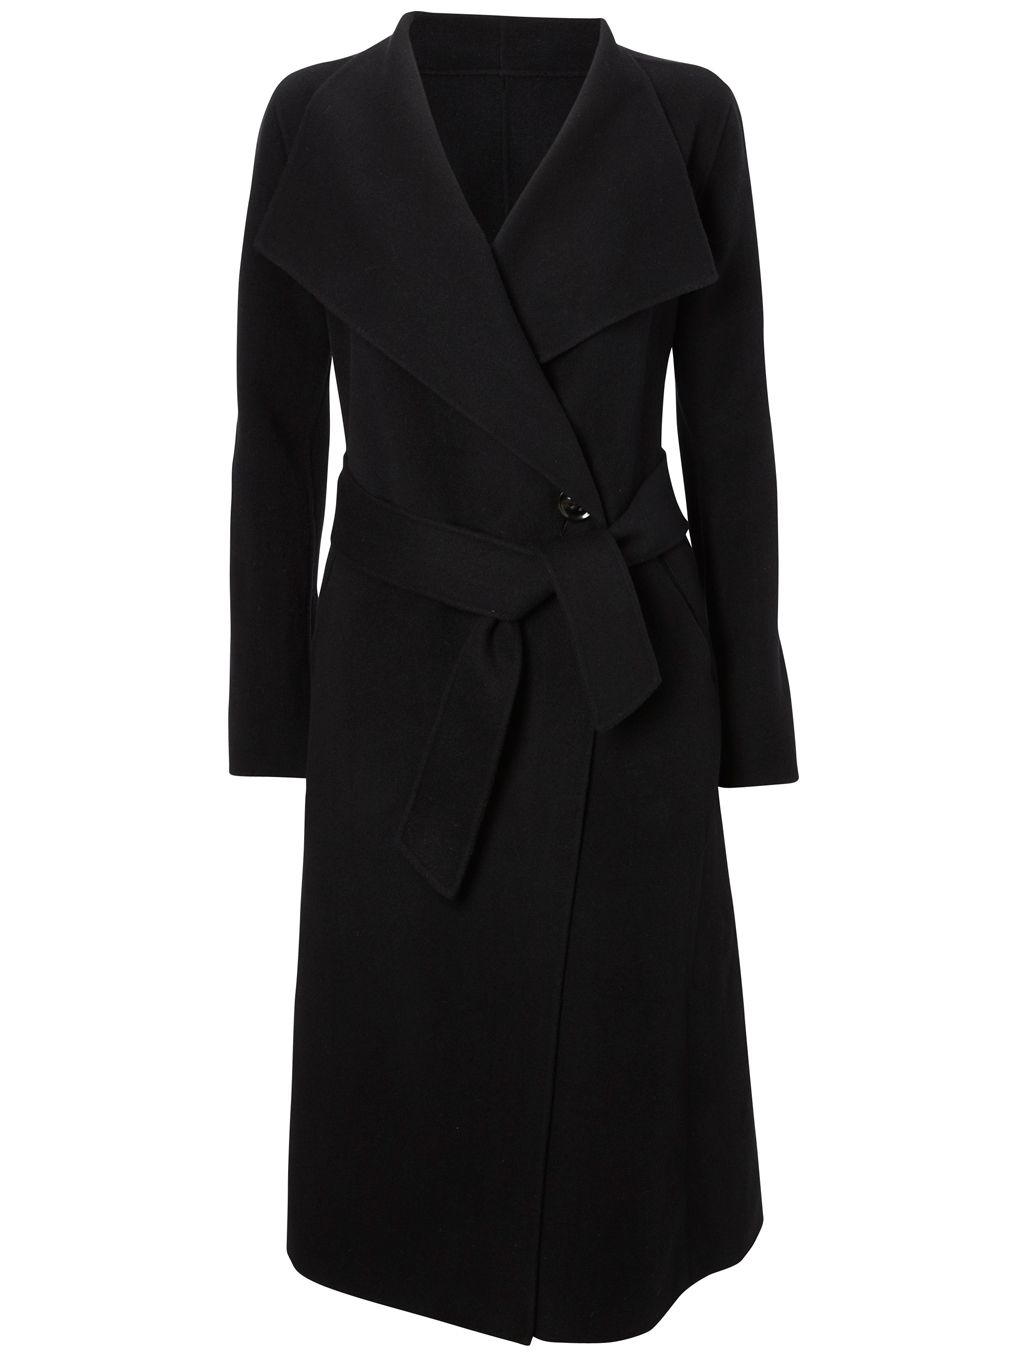 Viyella Long Sleeve Double Faced Wrap Coat, Black at John Lewis